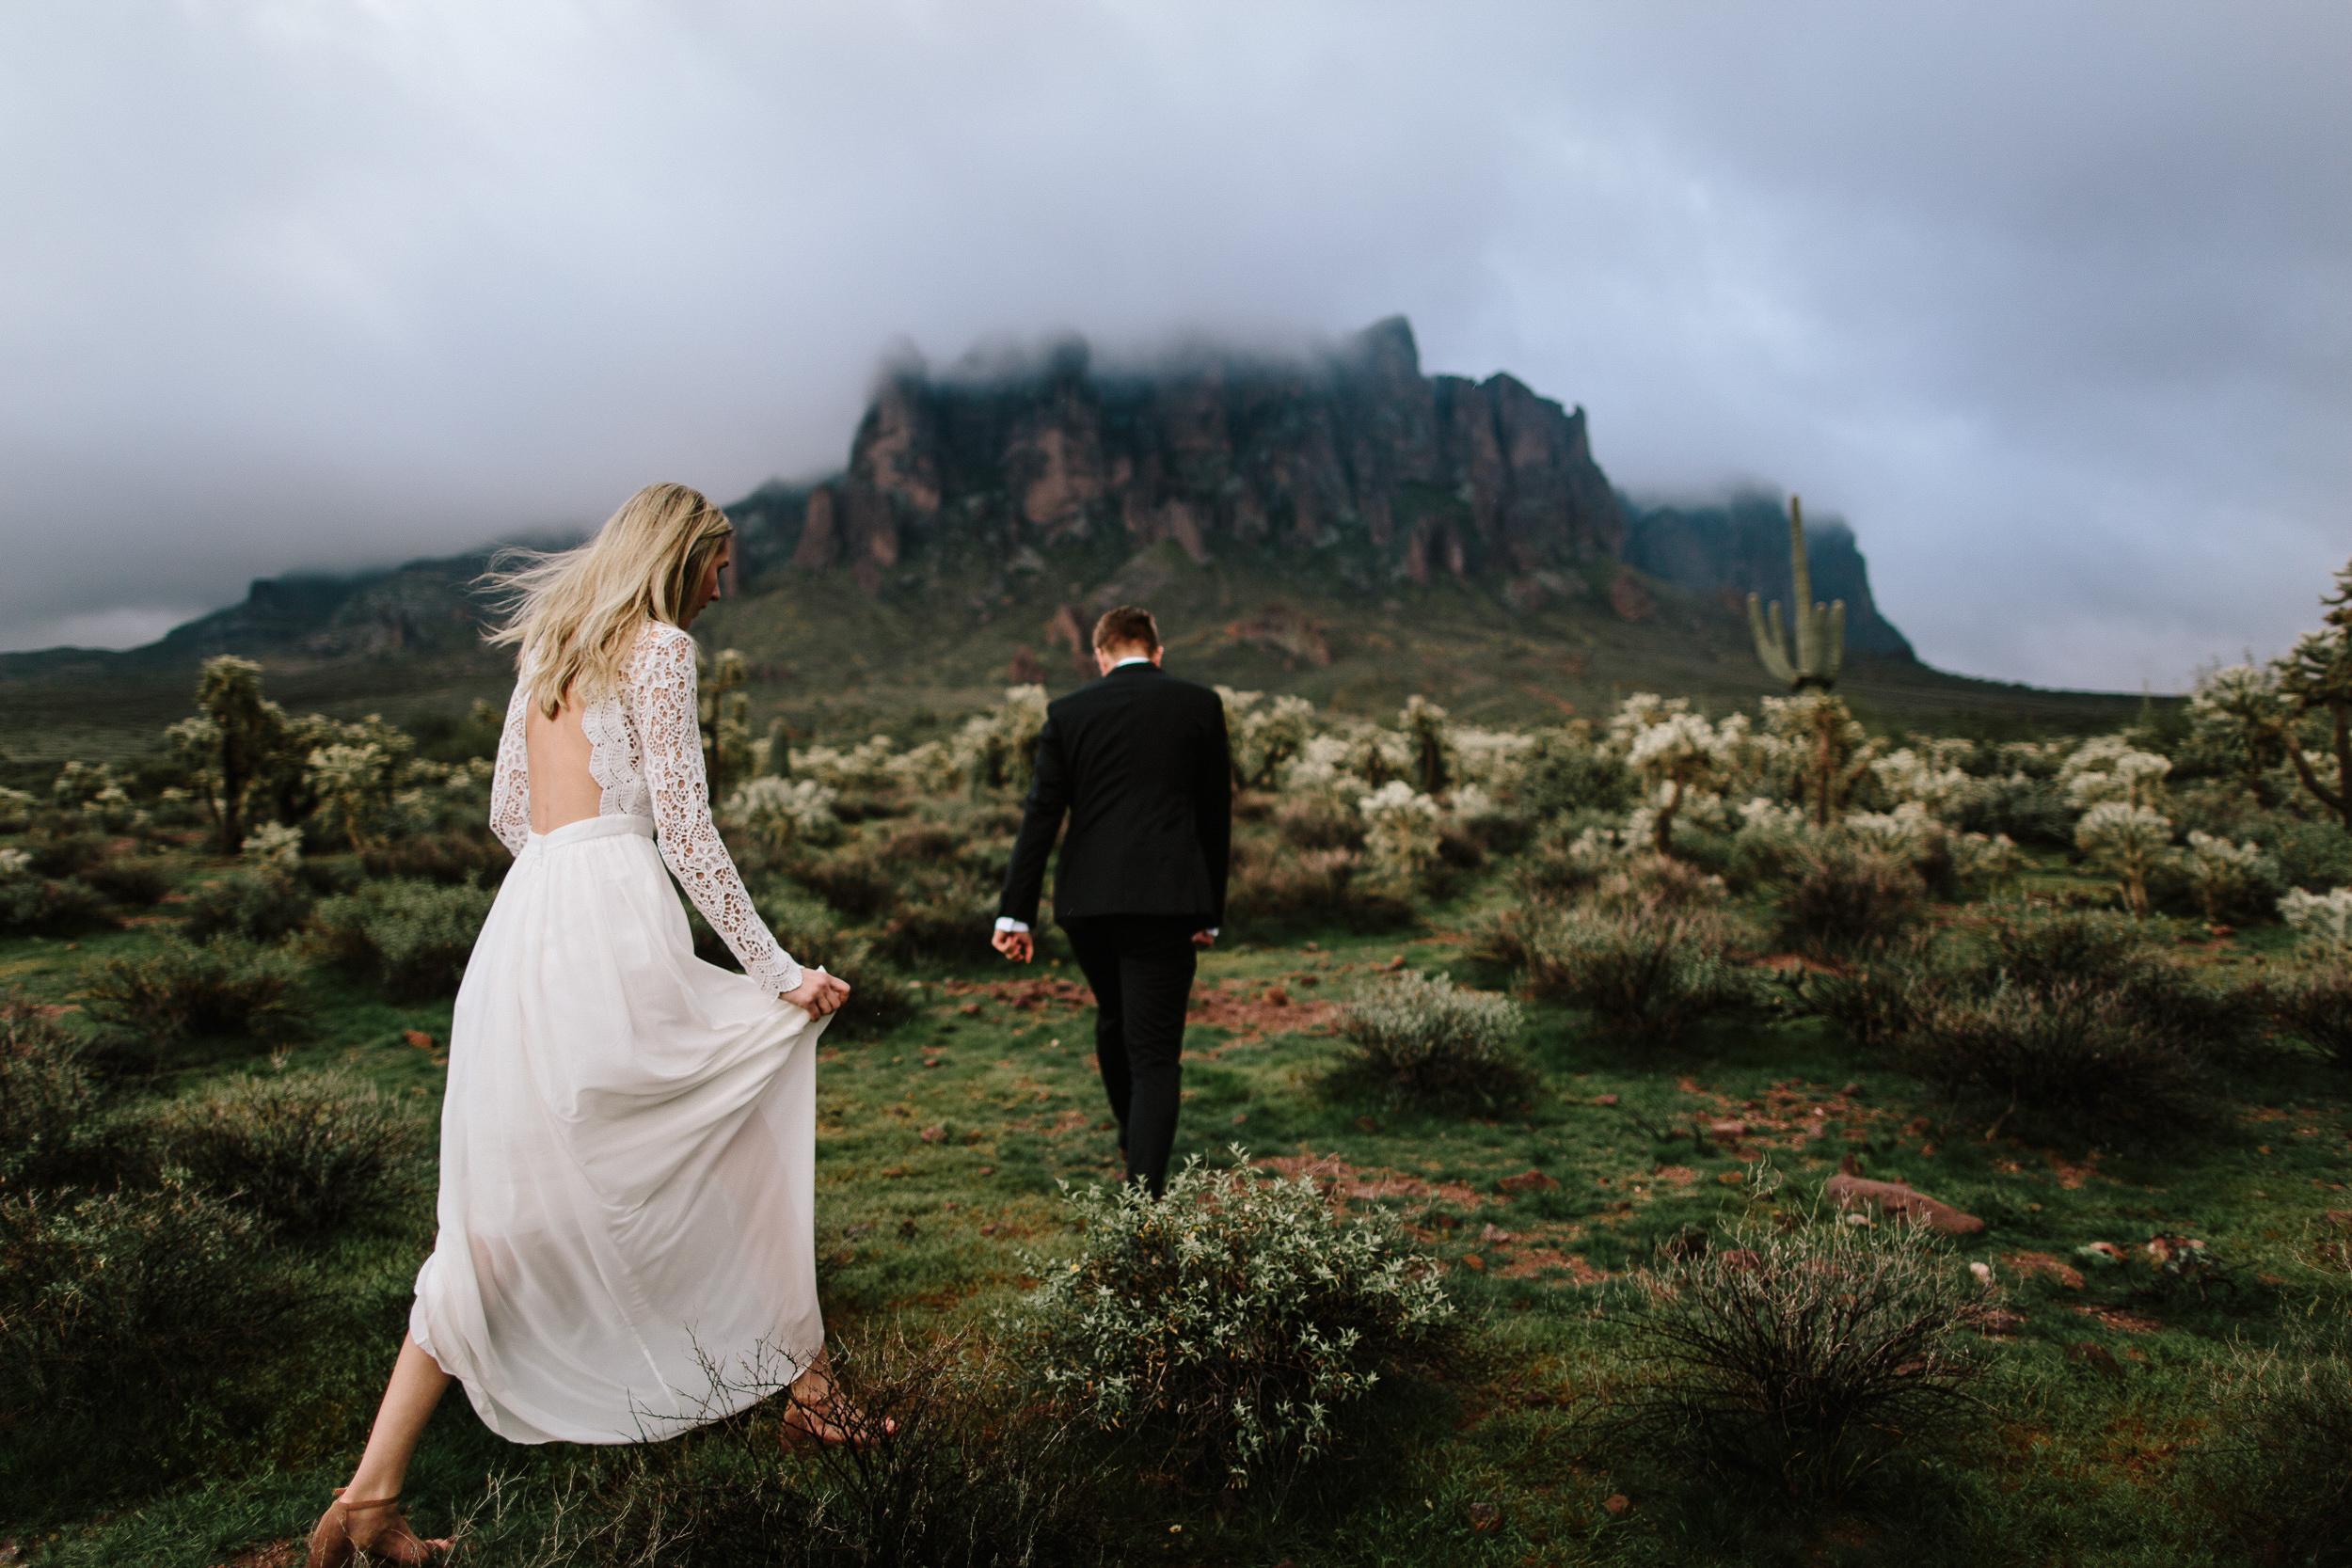 phoenix-mesa-elopement-wedding-photographer-lost-dutchman-state-park-superstitious-mountains-17.jpg